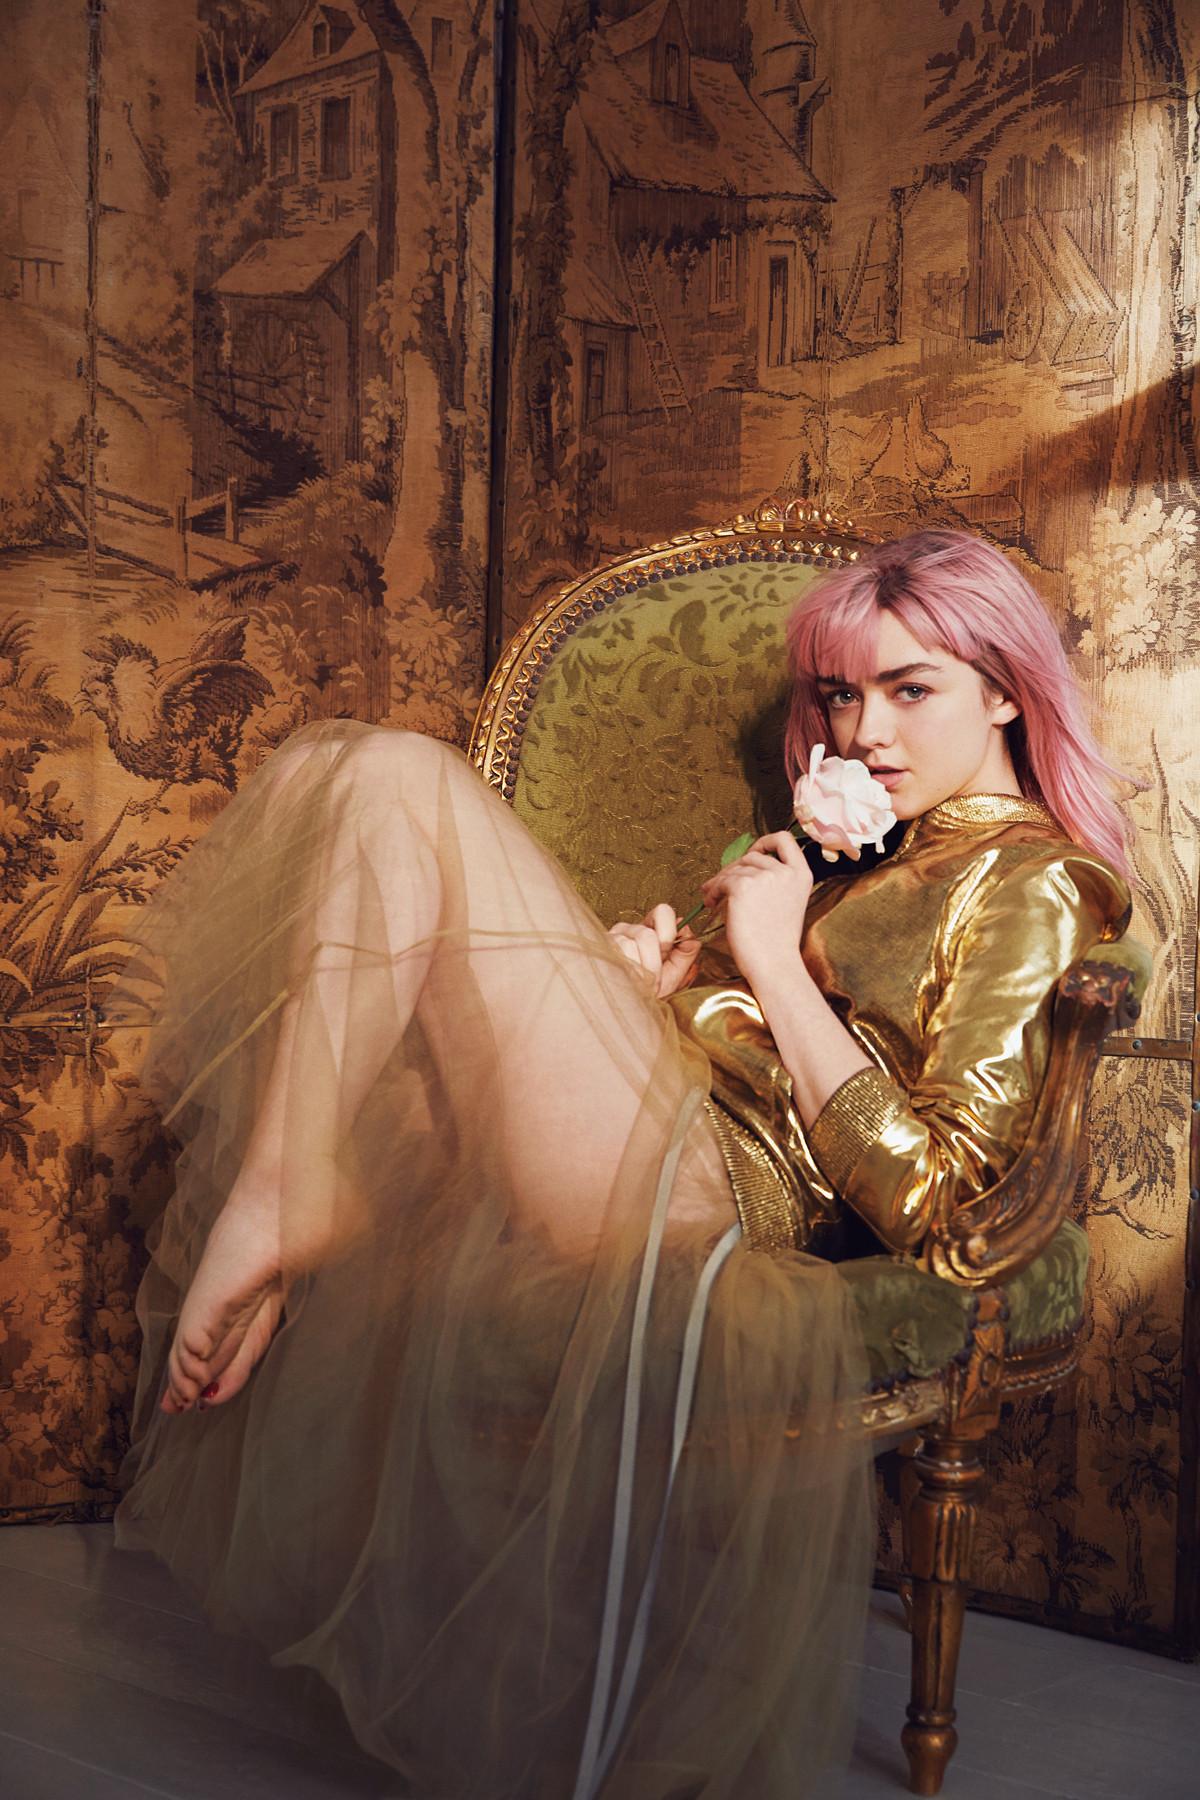 People 1200x1800 Maisie Williams actress women pink hair barefoot painted toenails sitting feet